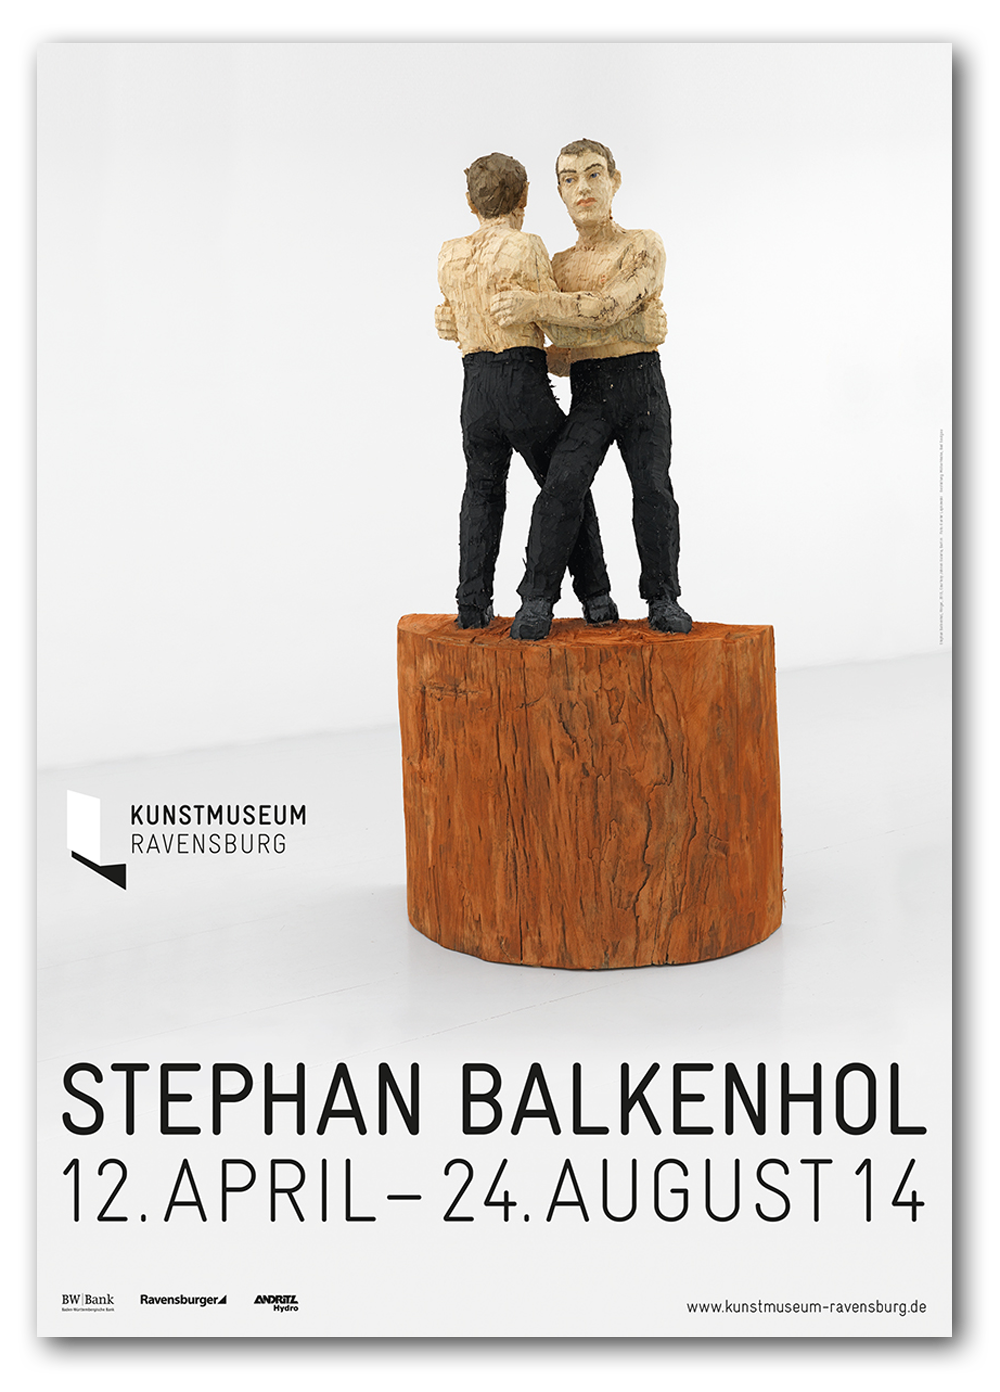 ausstellungsplakate kunstmuseum ravensburg. Black Bedroom Furniture Sets. Home Design Ideas